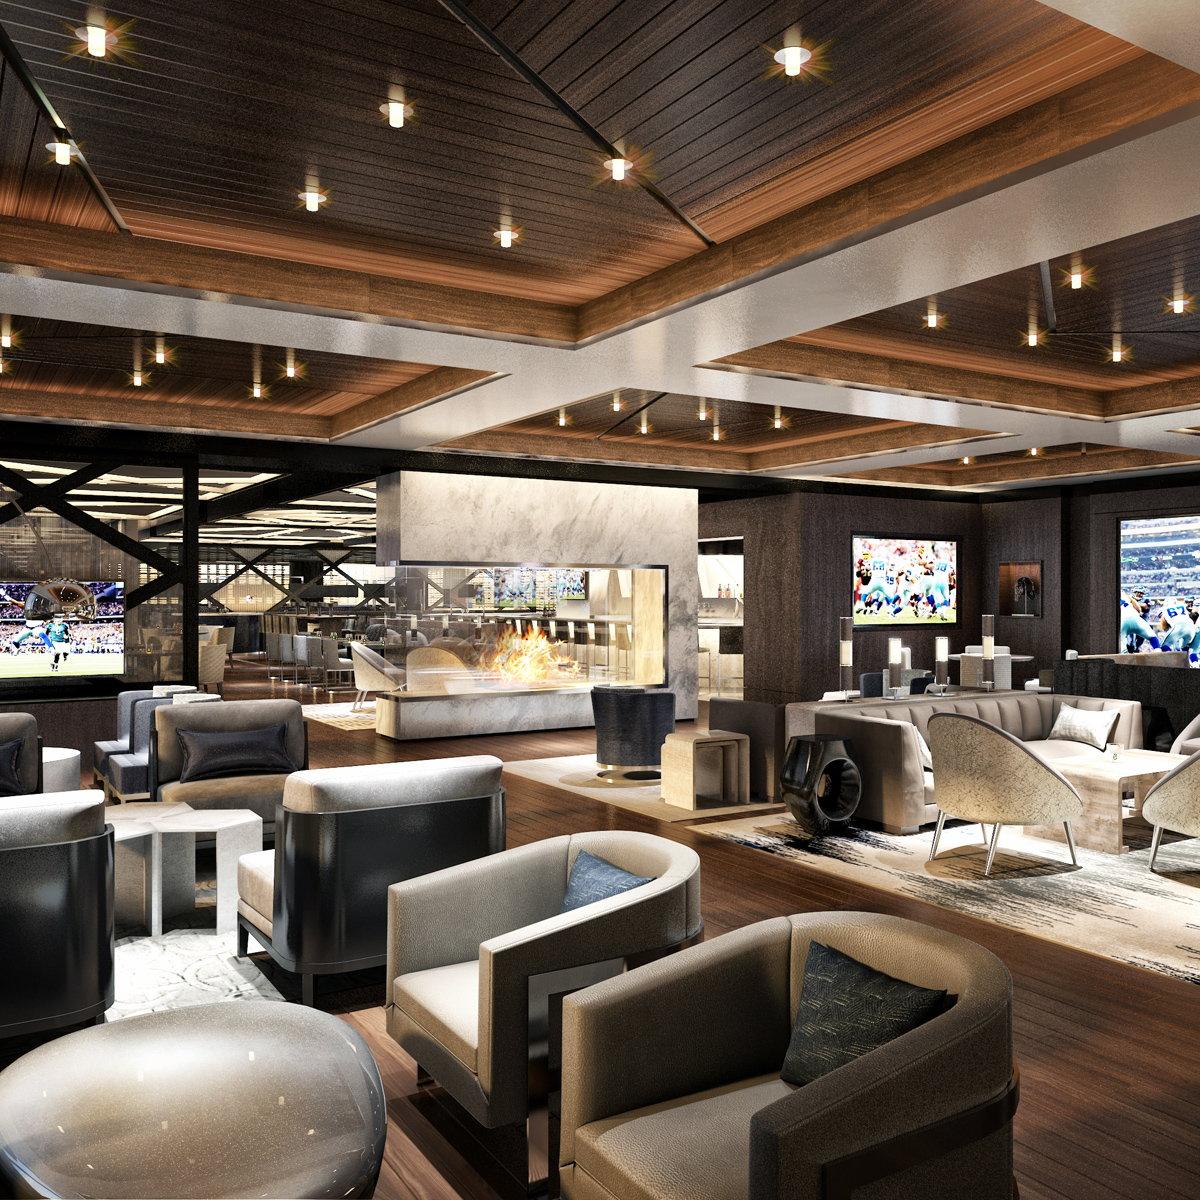 cowboys club icrave designs unrivaled experience driven sports venue